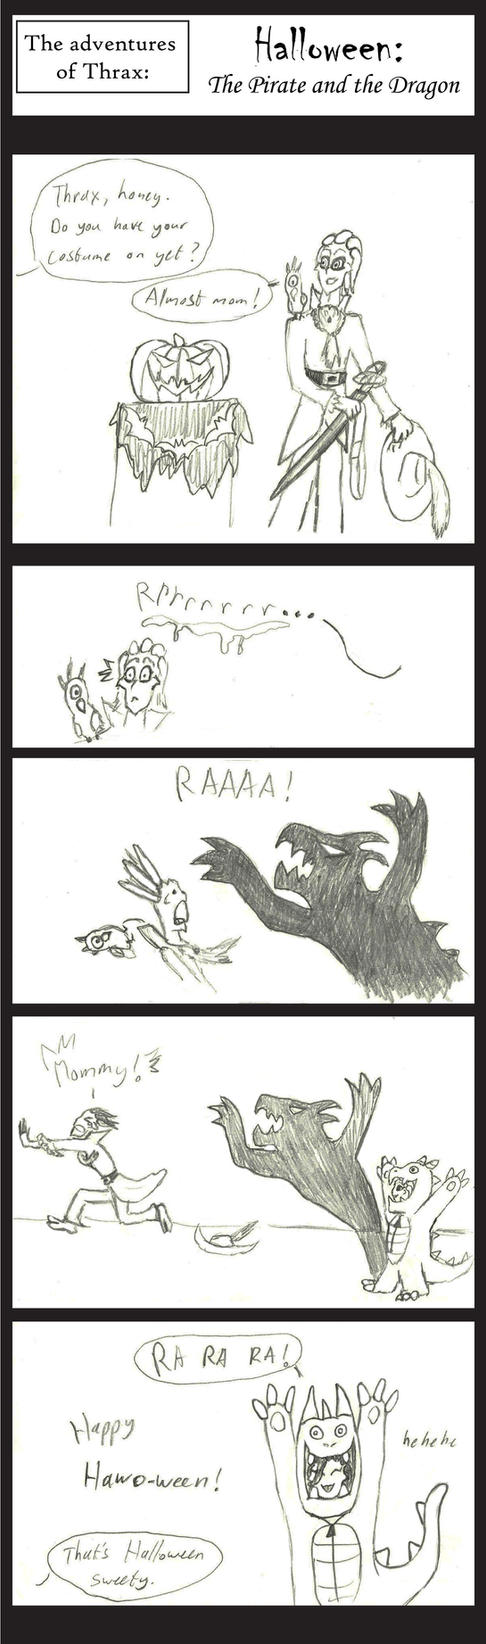 Thrax's Halloween adventures by ArtemisDragonheart